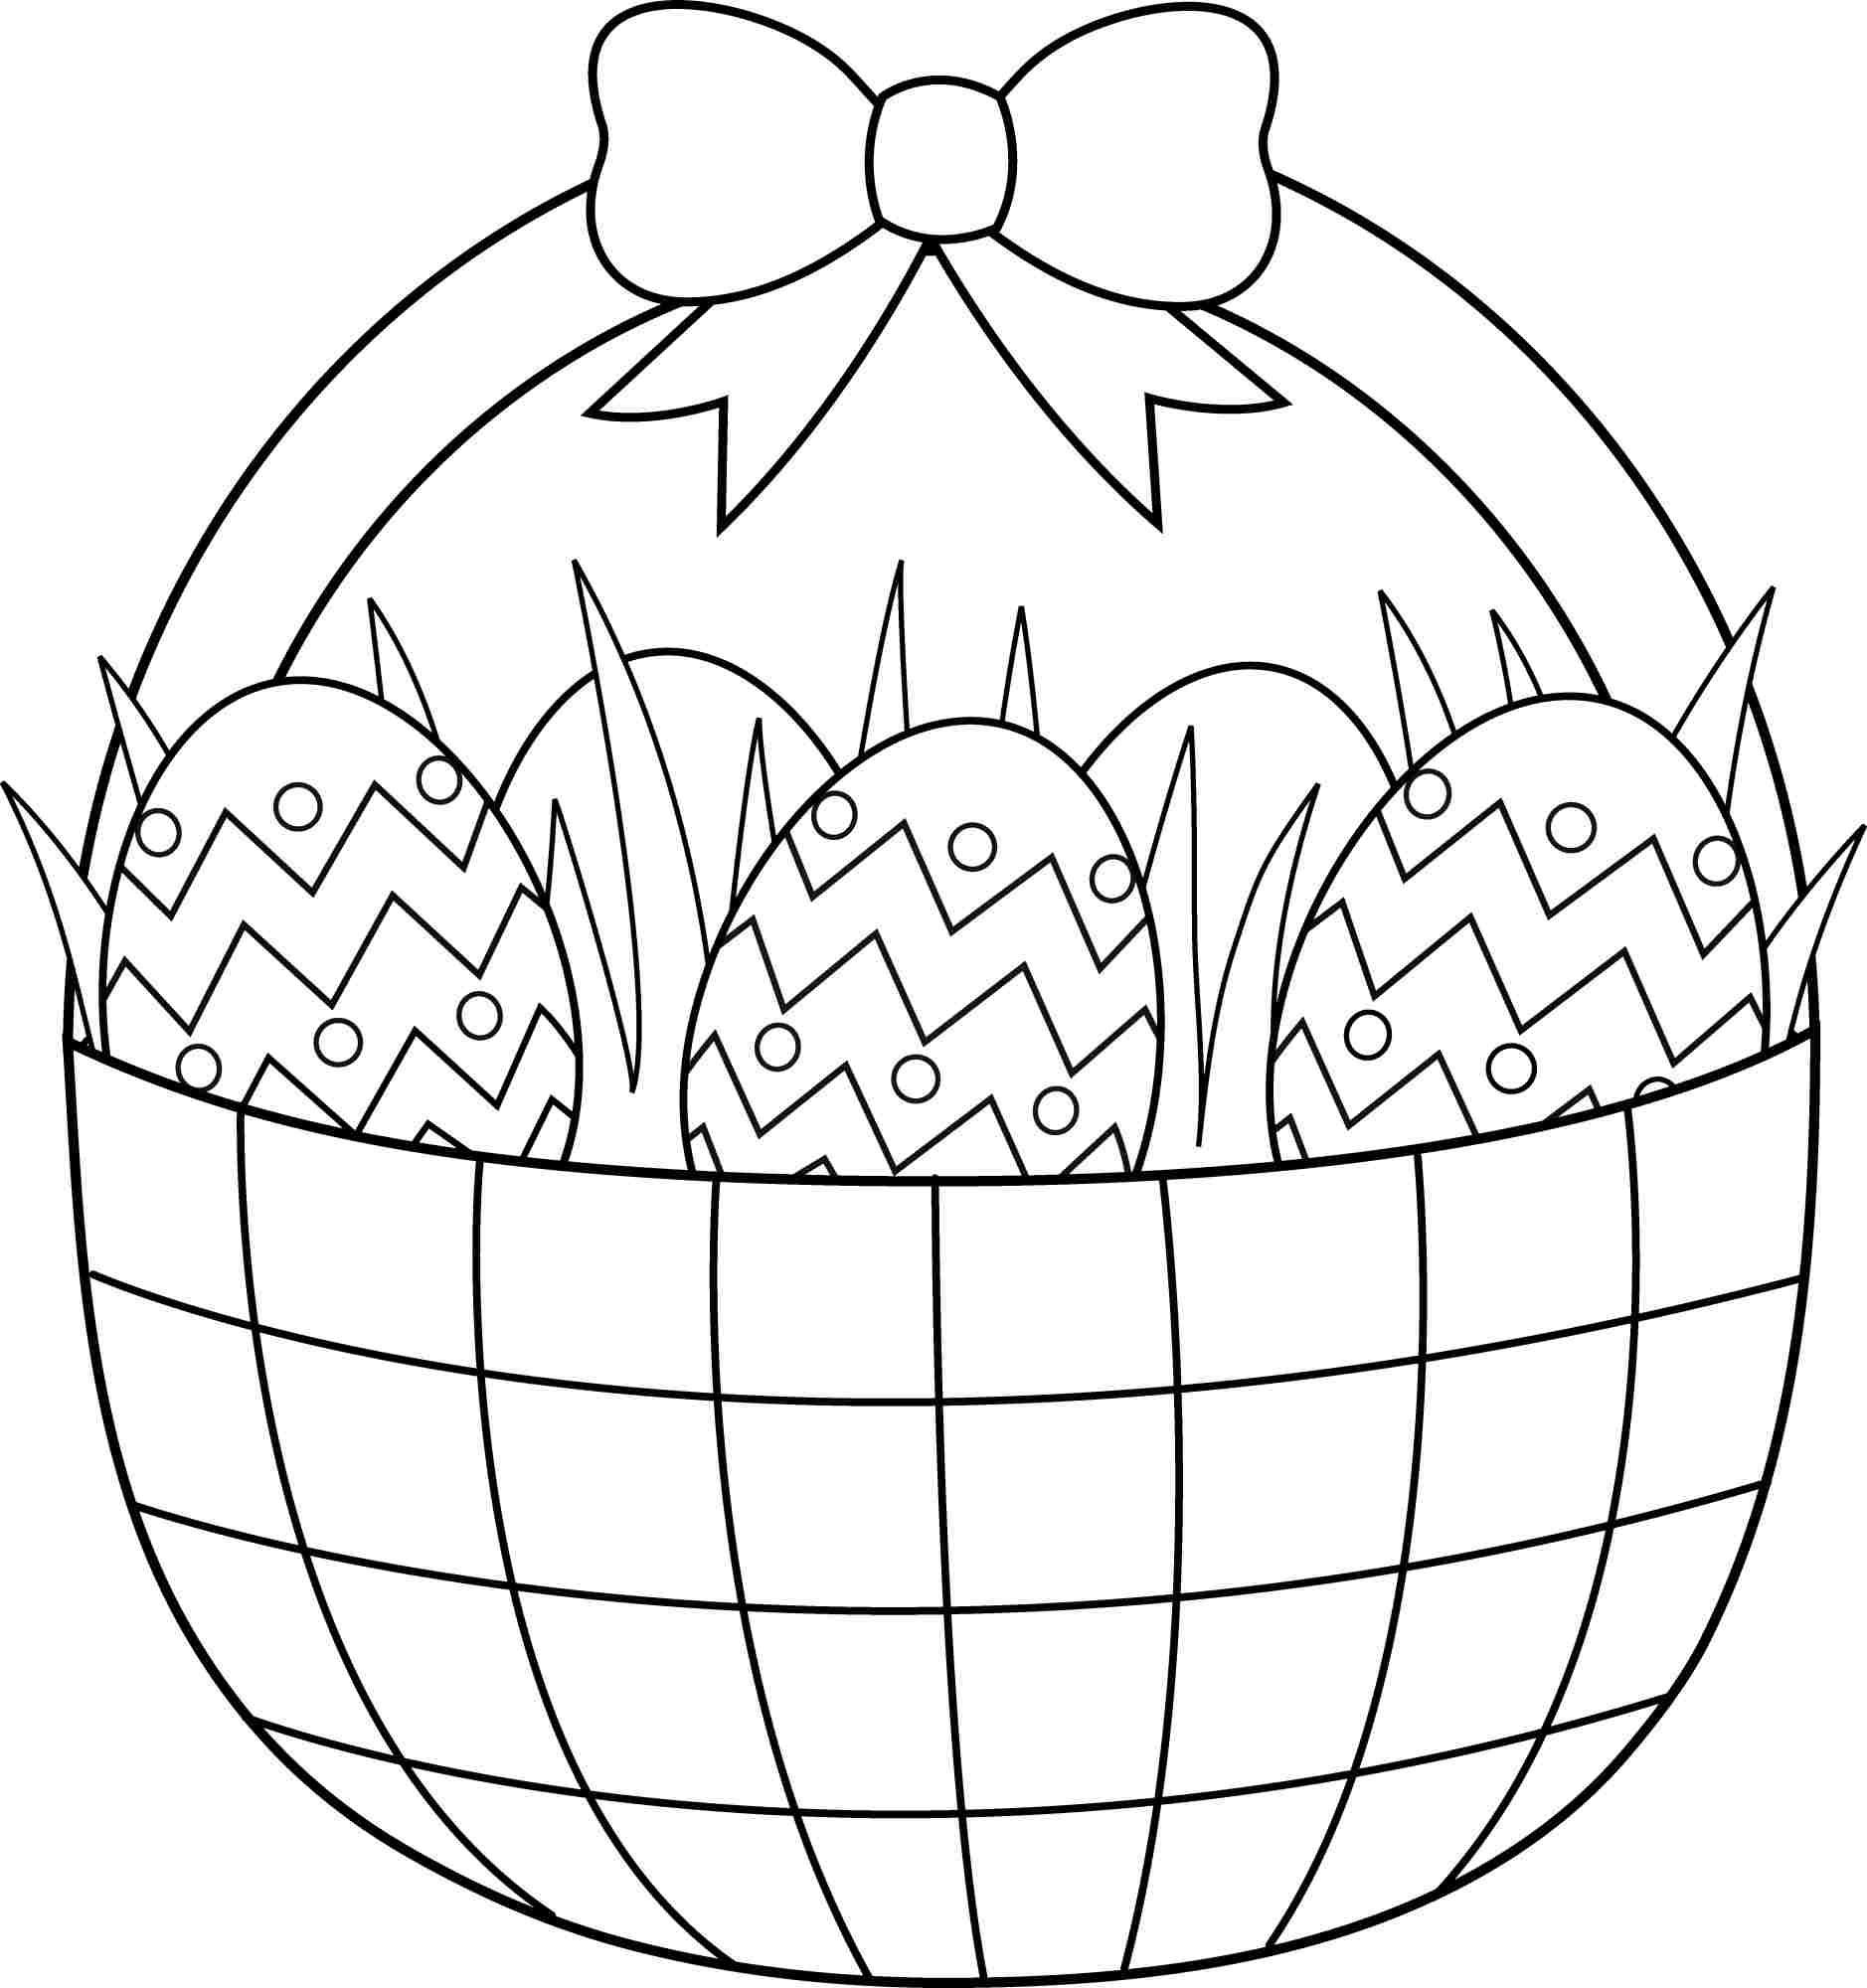 Free Printable Easter Stuff. Printable. Free Printable Worksheets - Free Printable Easter Stuff